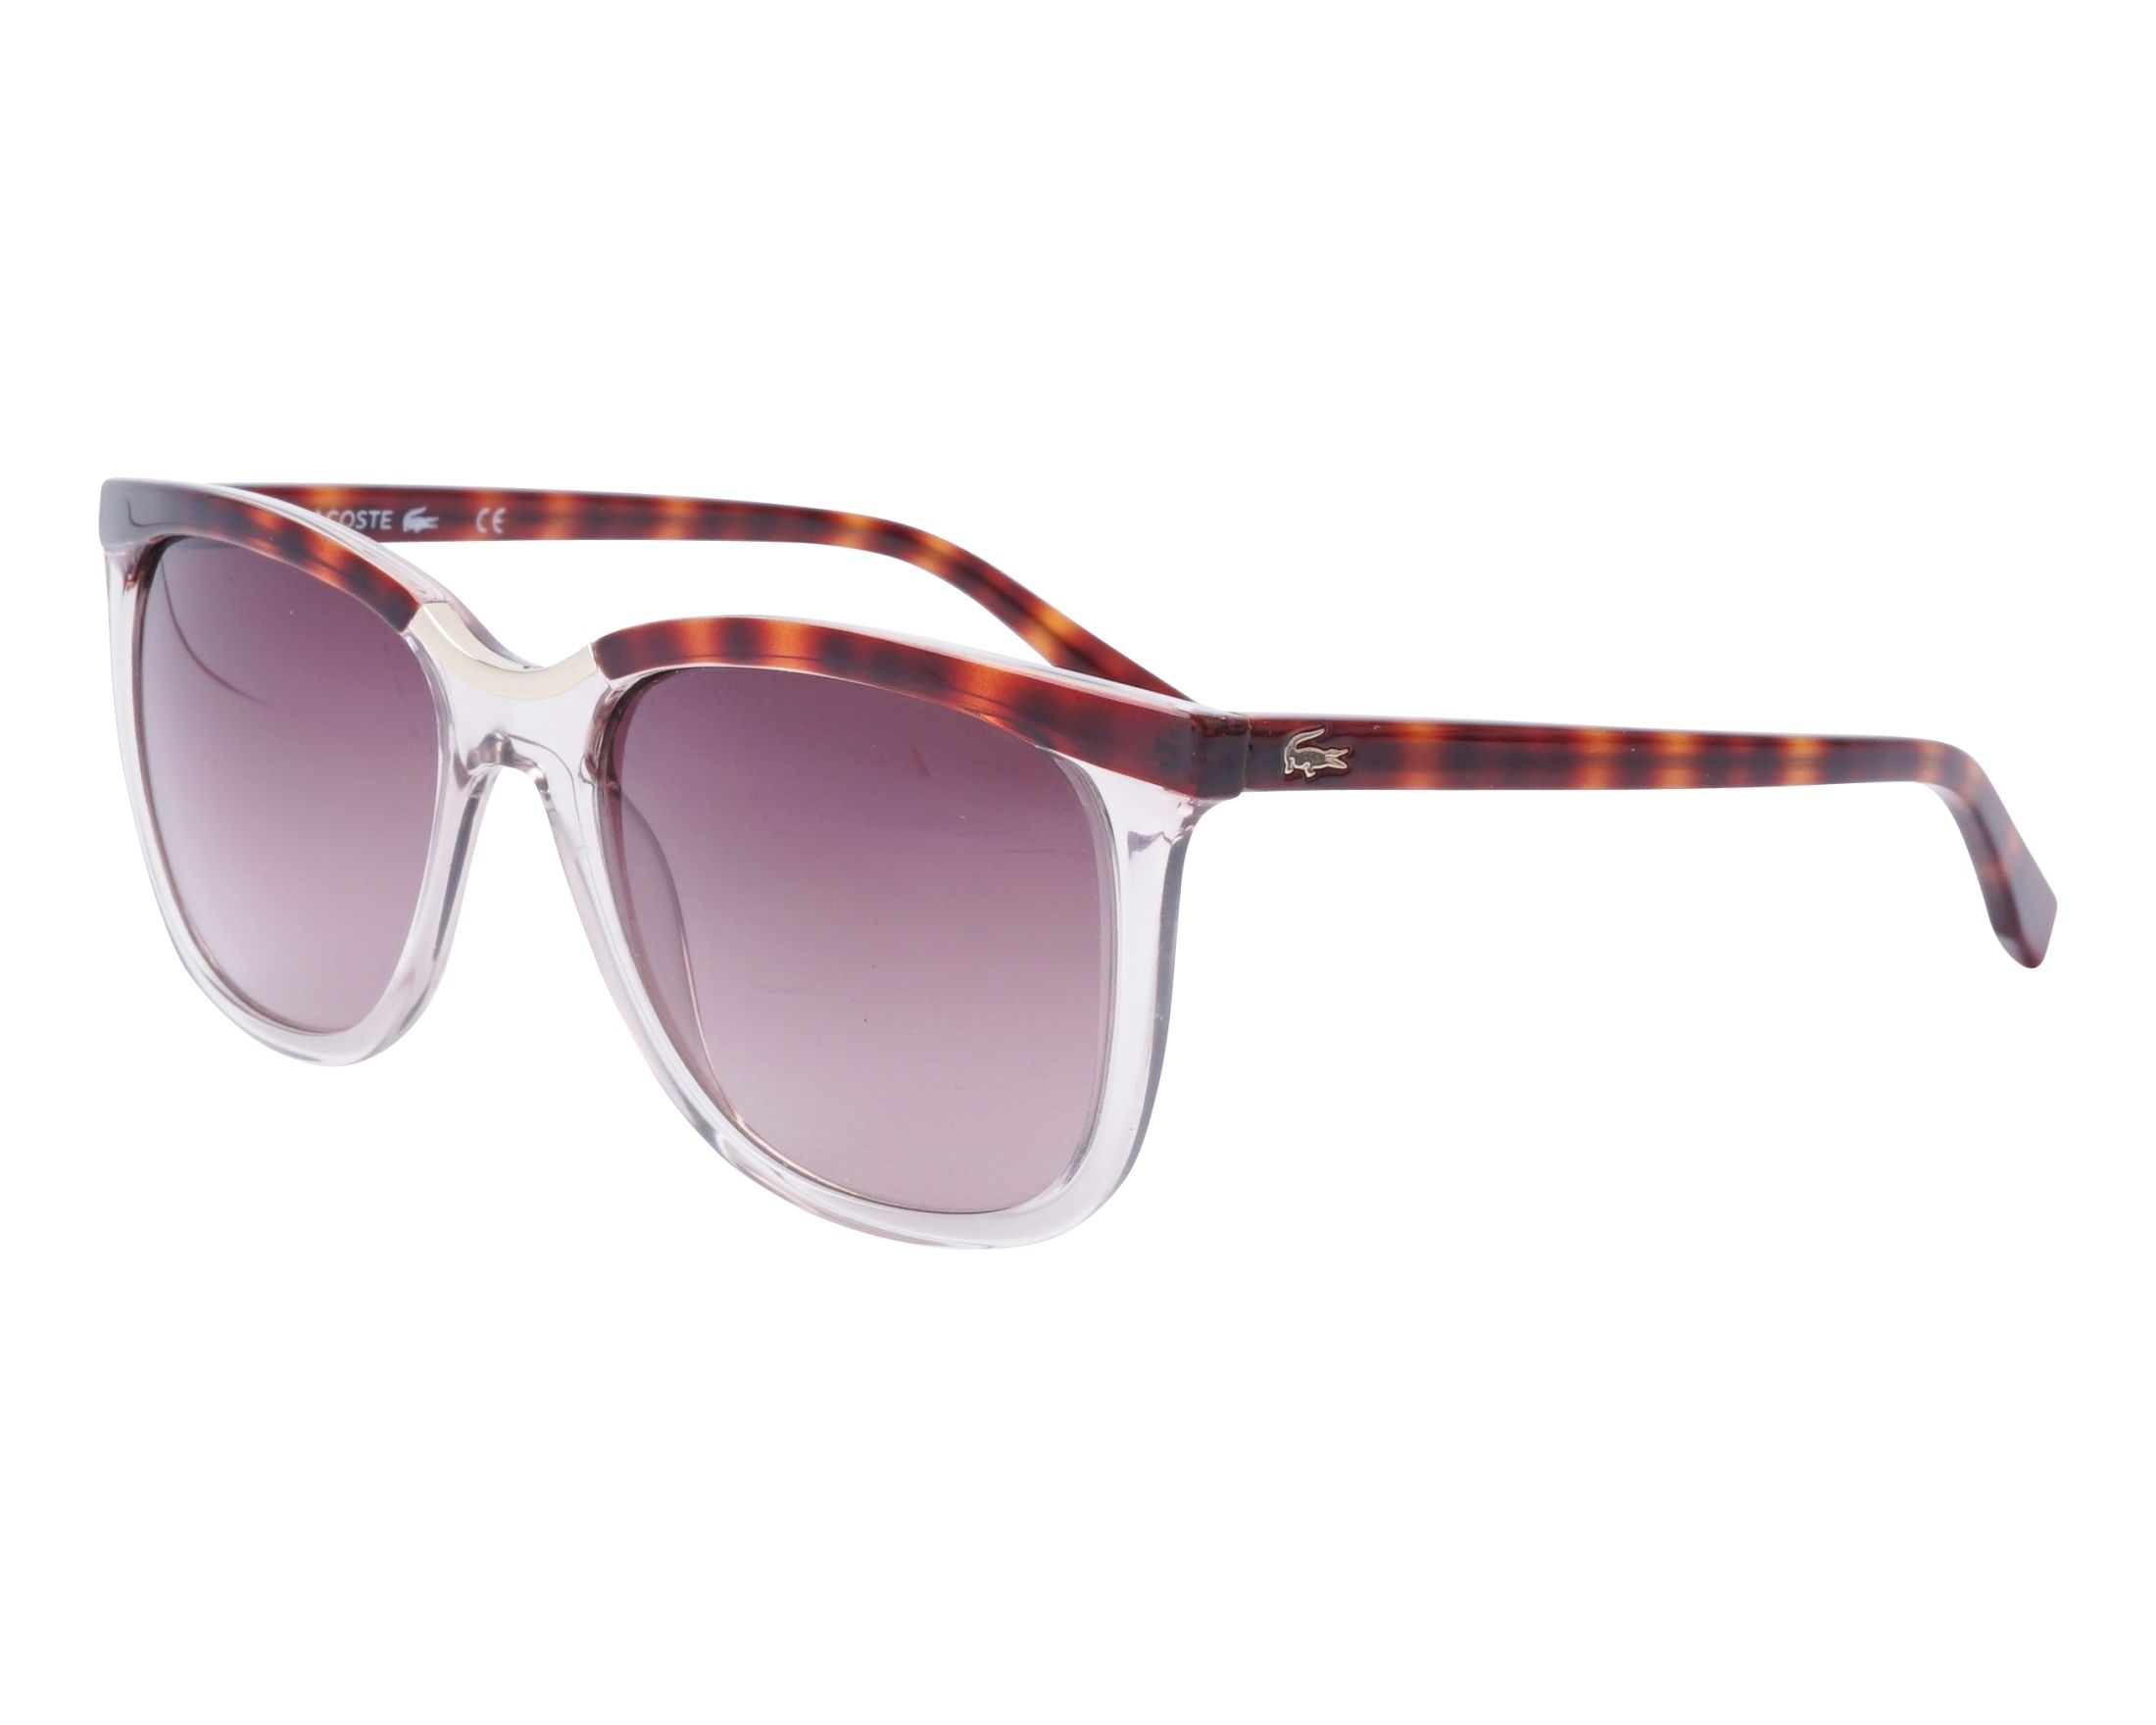 fc30446662f Sunglasses Lacoste L-824-S 662 55-17 Crystal Havana profile view